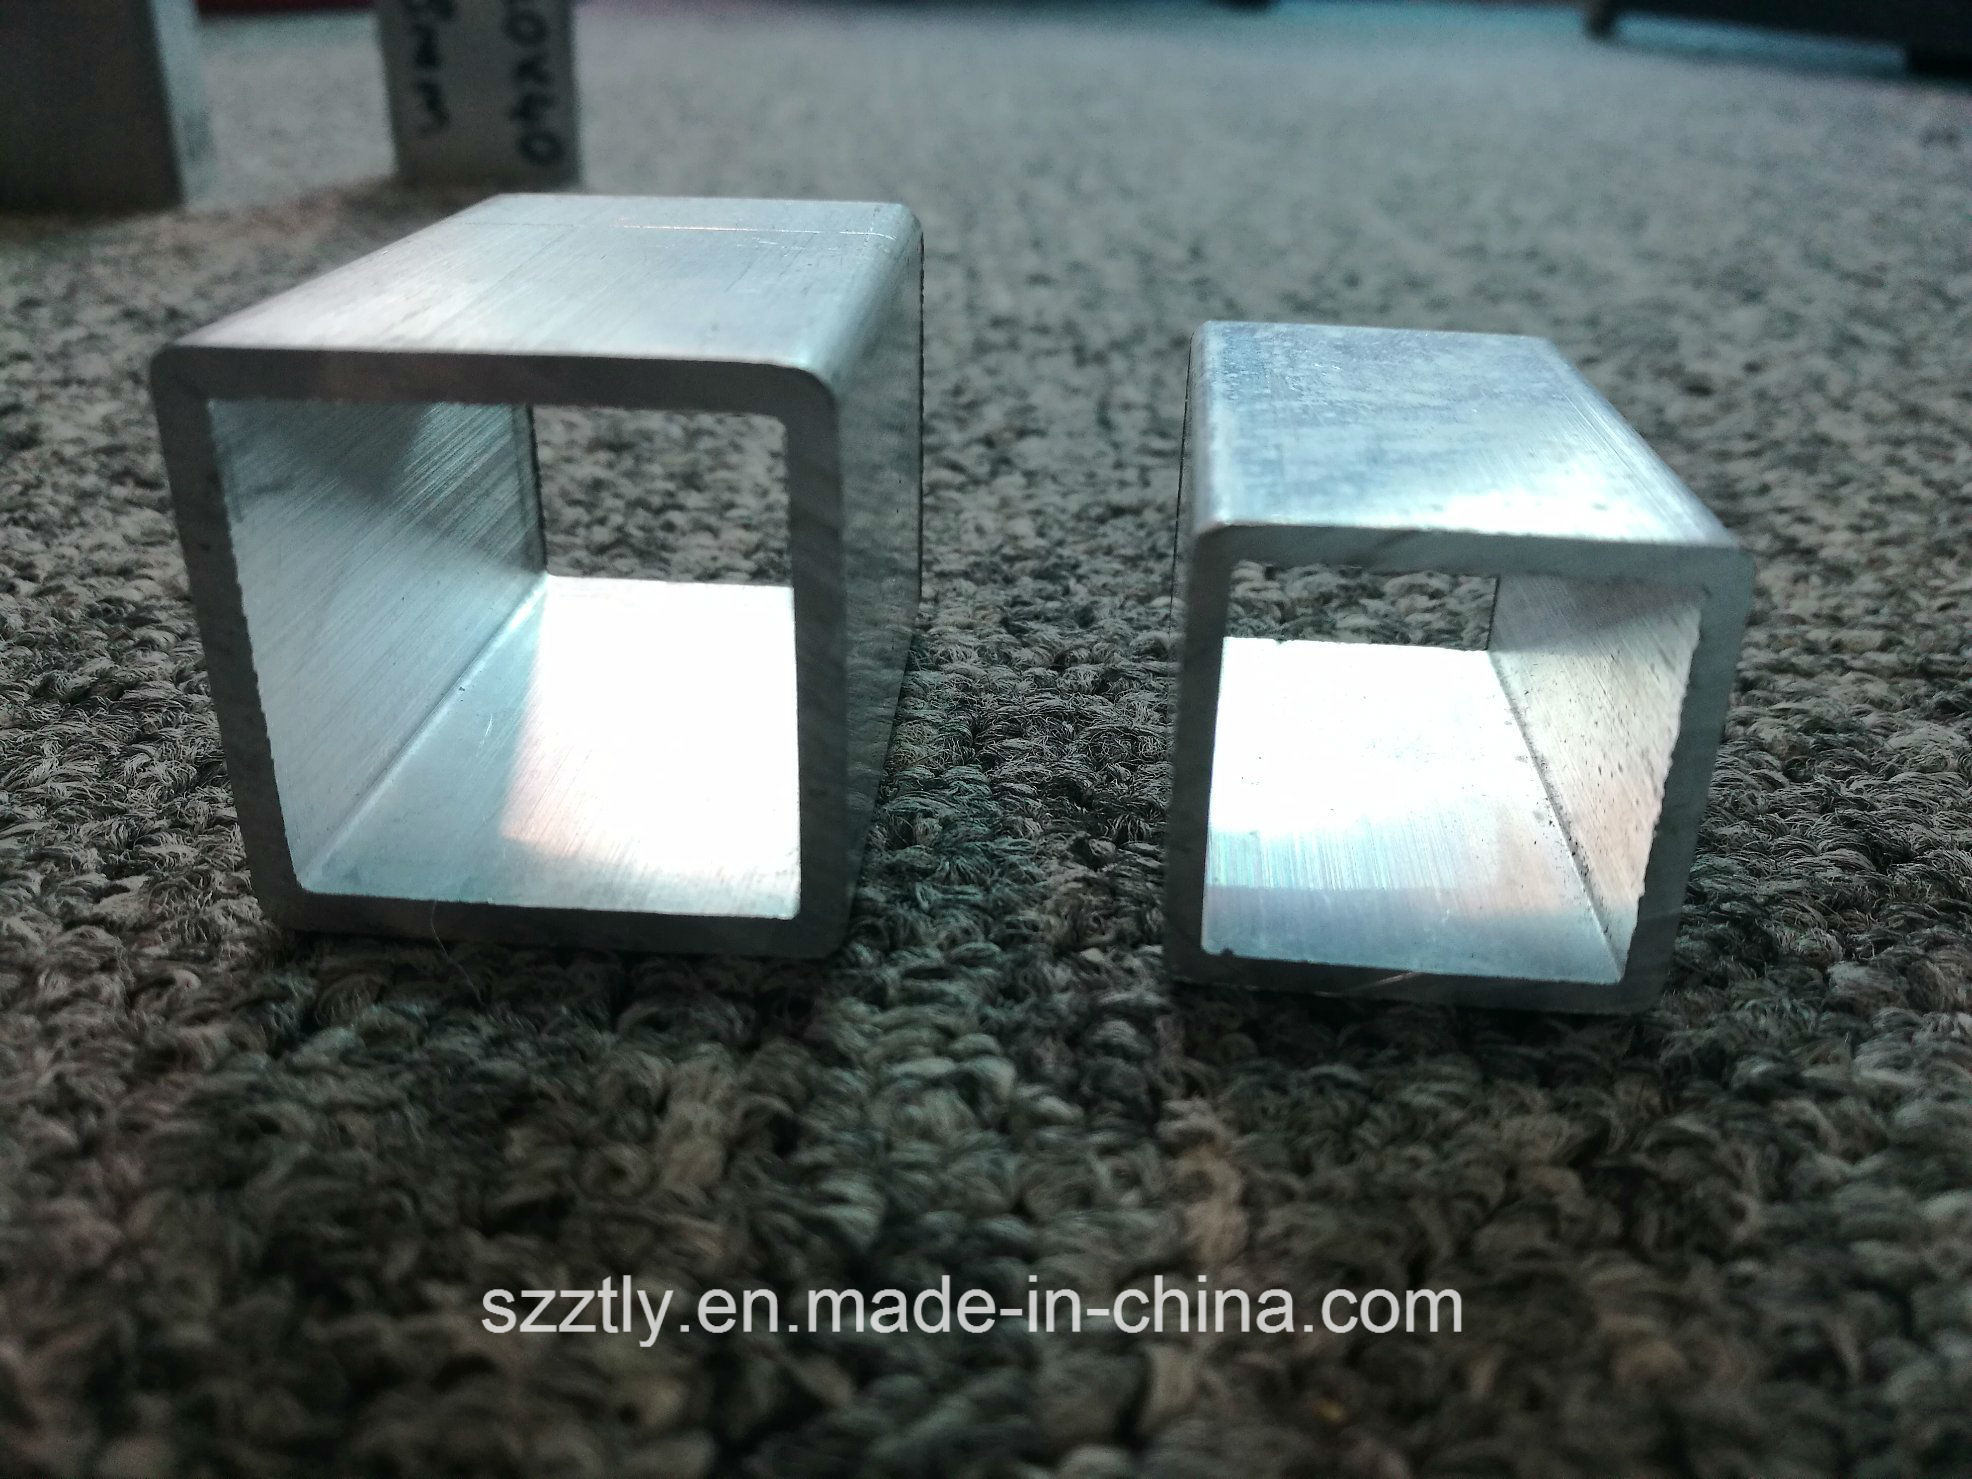 6000 Alloy Regular Sizes Aluminum Extruded Square Tube 6X6 ~200X200mm